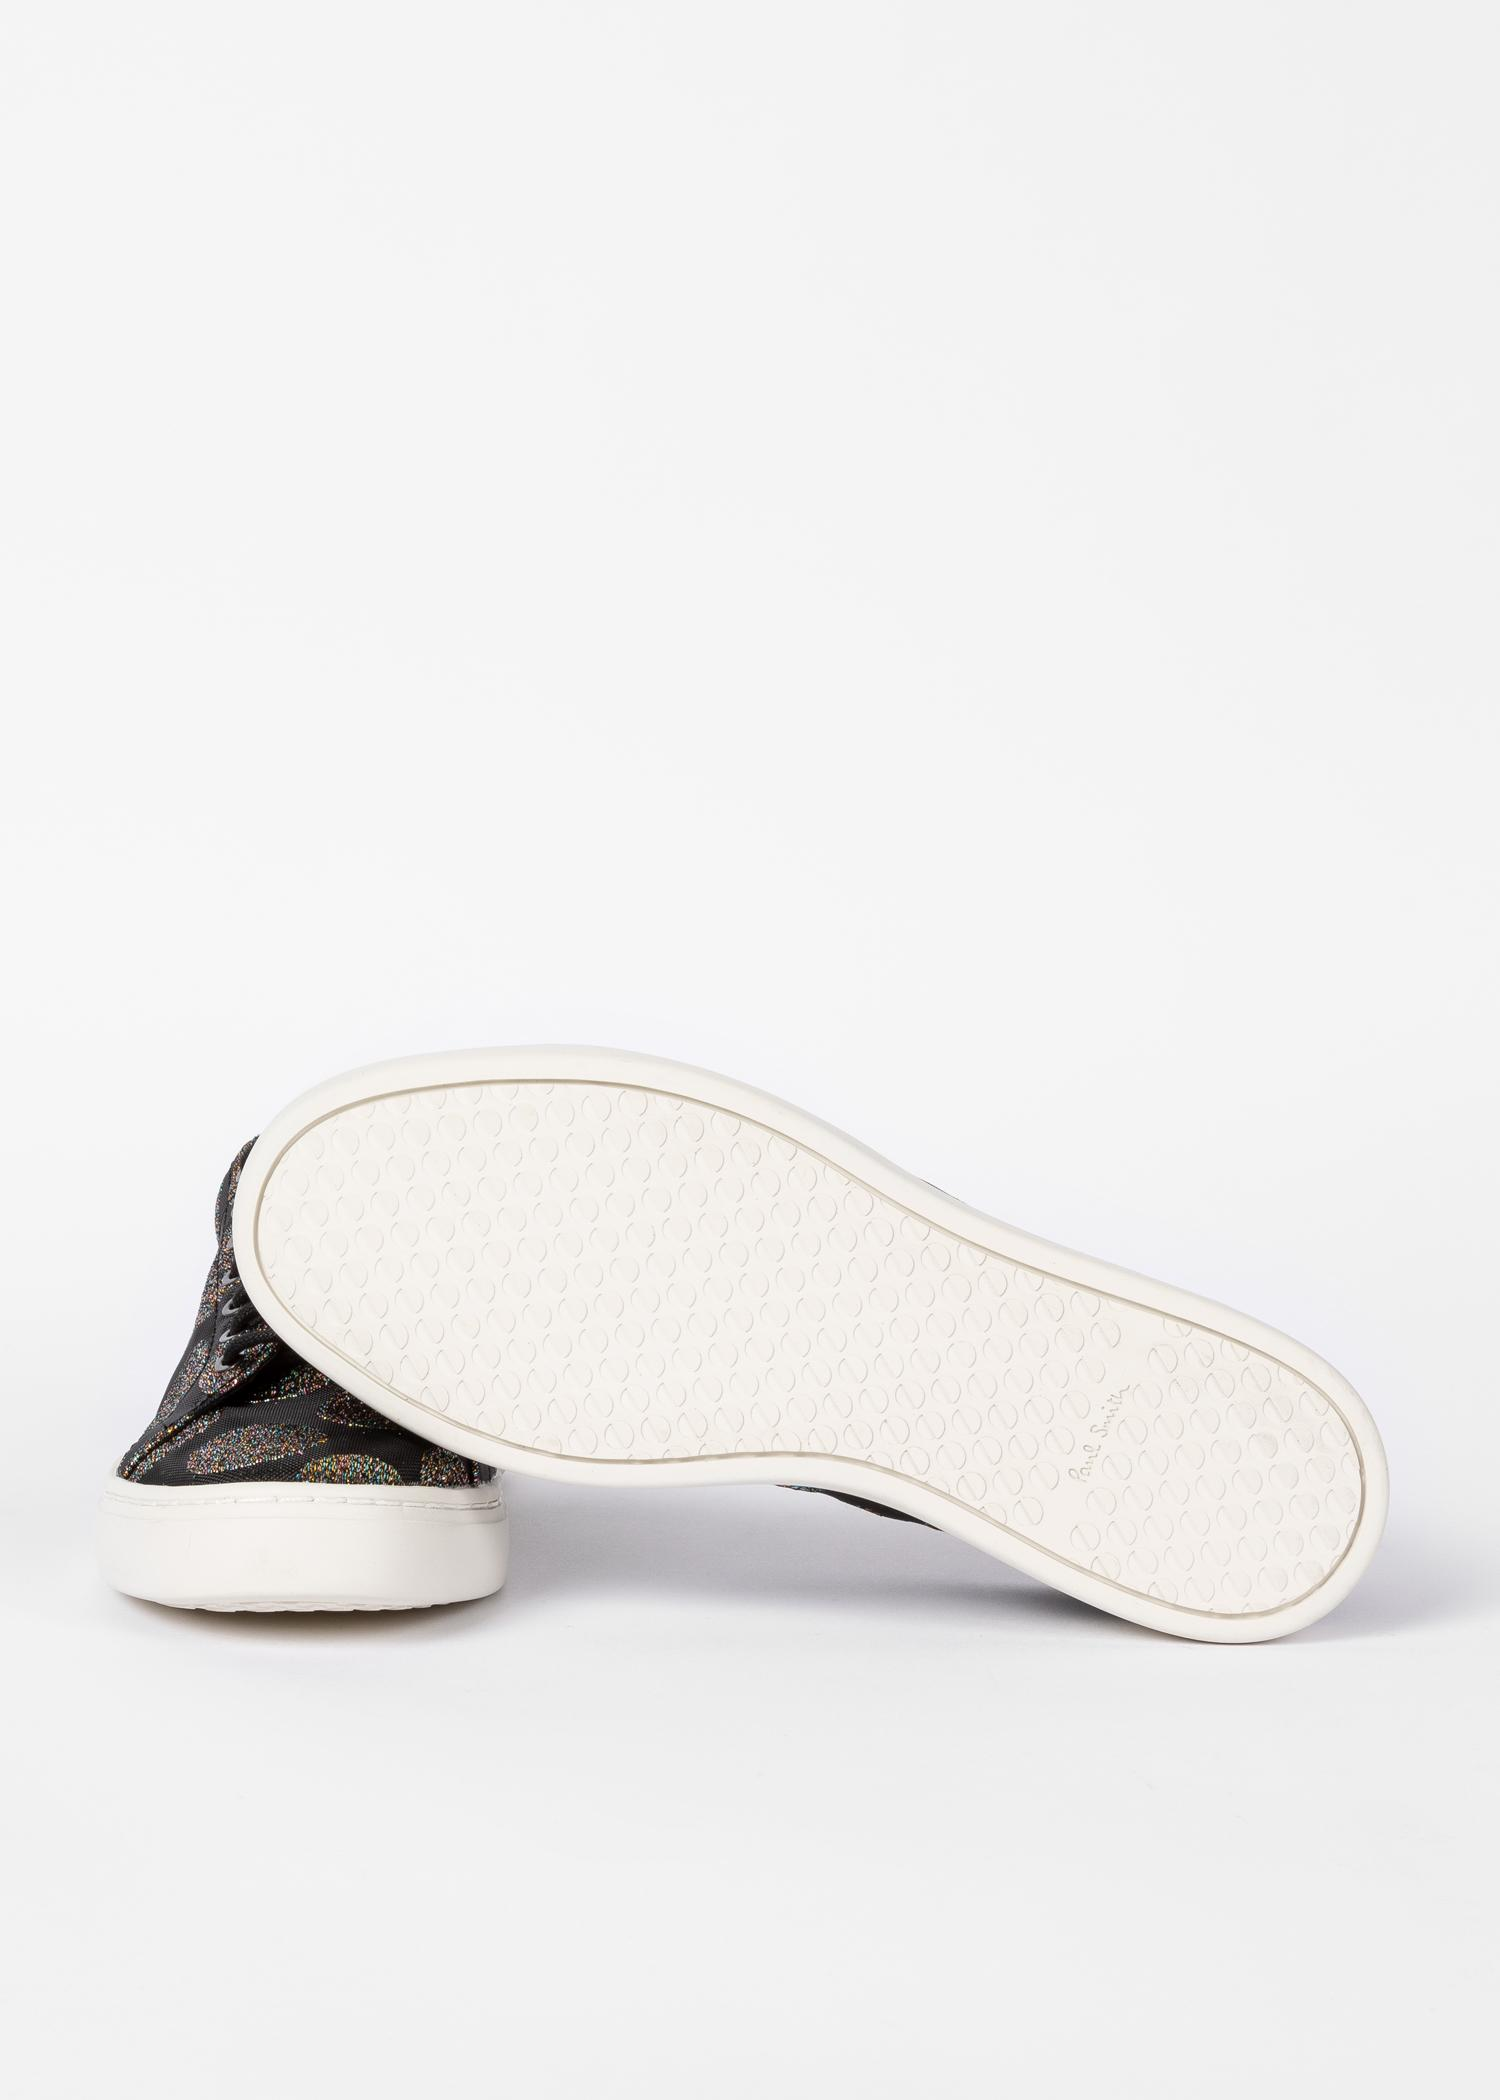 b33168ce6385 Lyst paul smith black mesh glitter polka dot lapin trainers in black jpg  1500x2100 Madden lapin